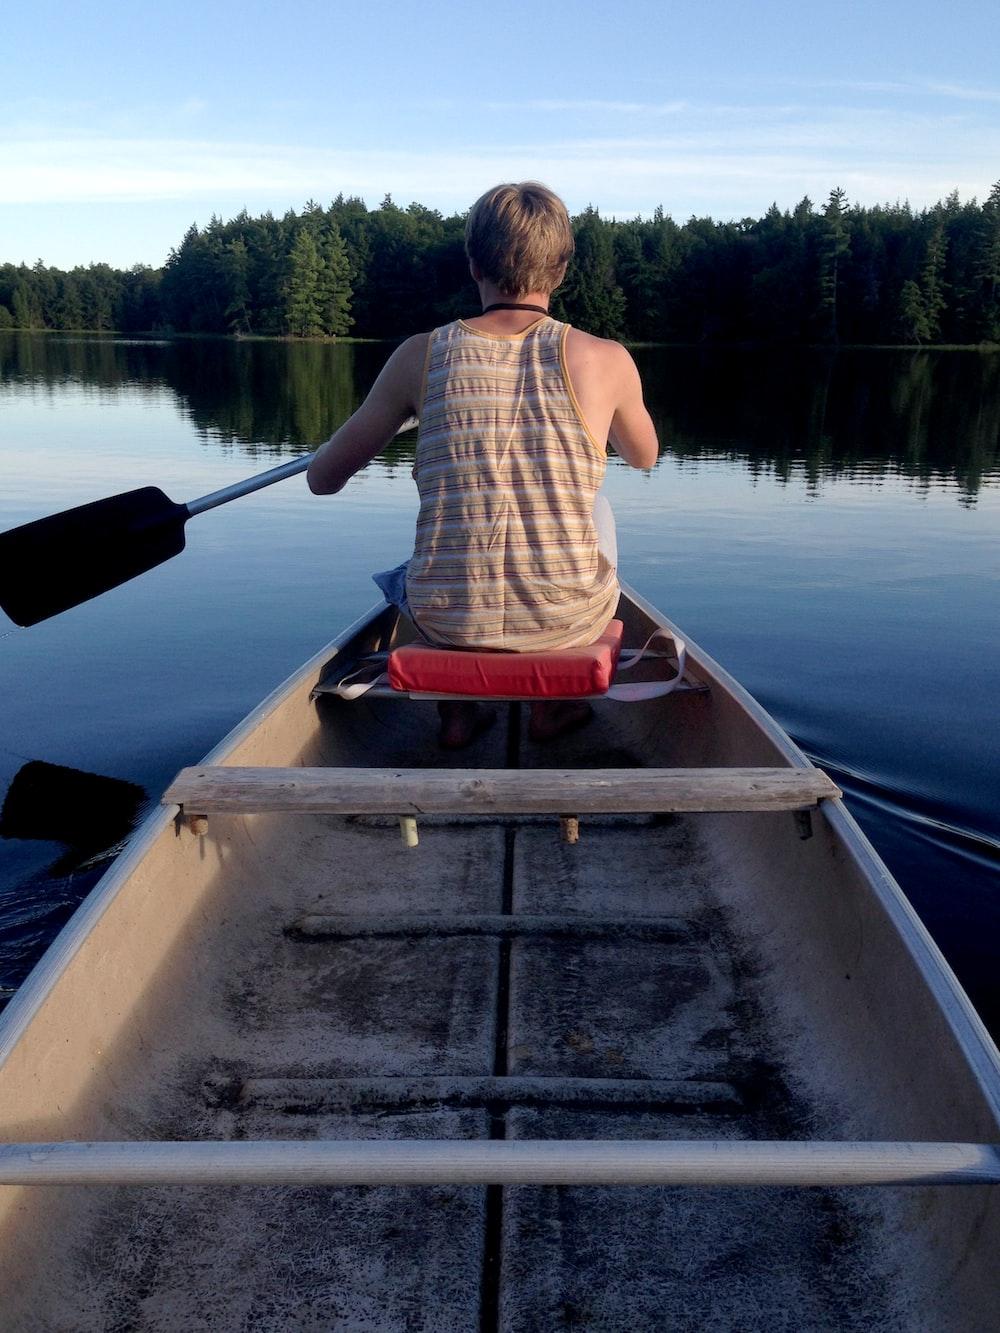 man sitting on boat at daytime